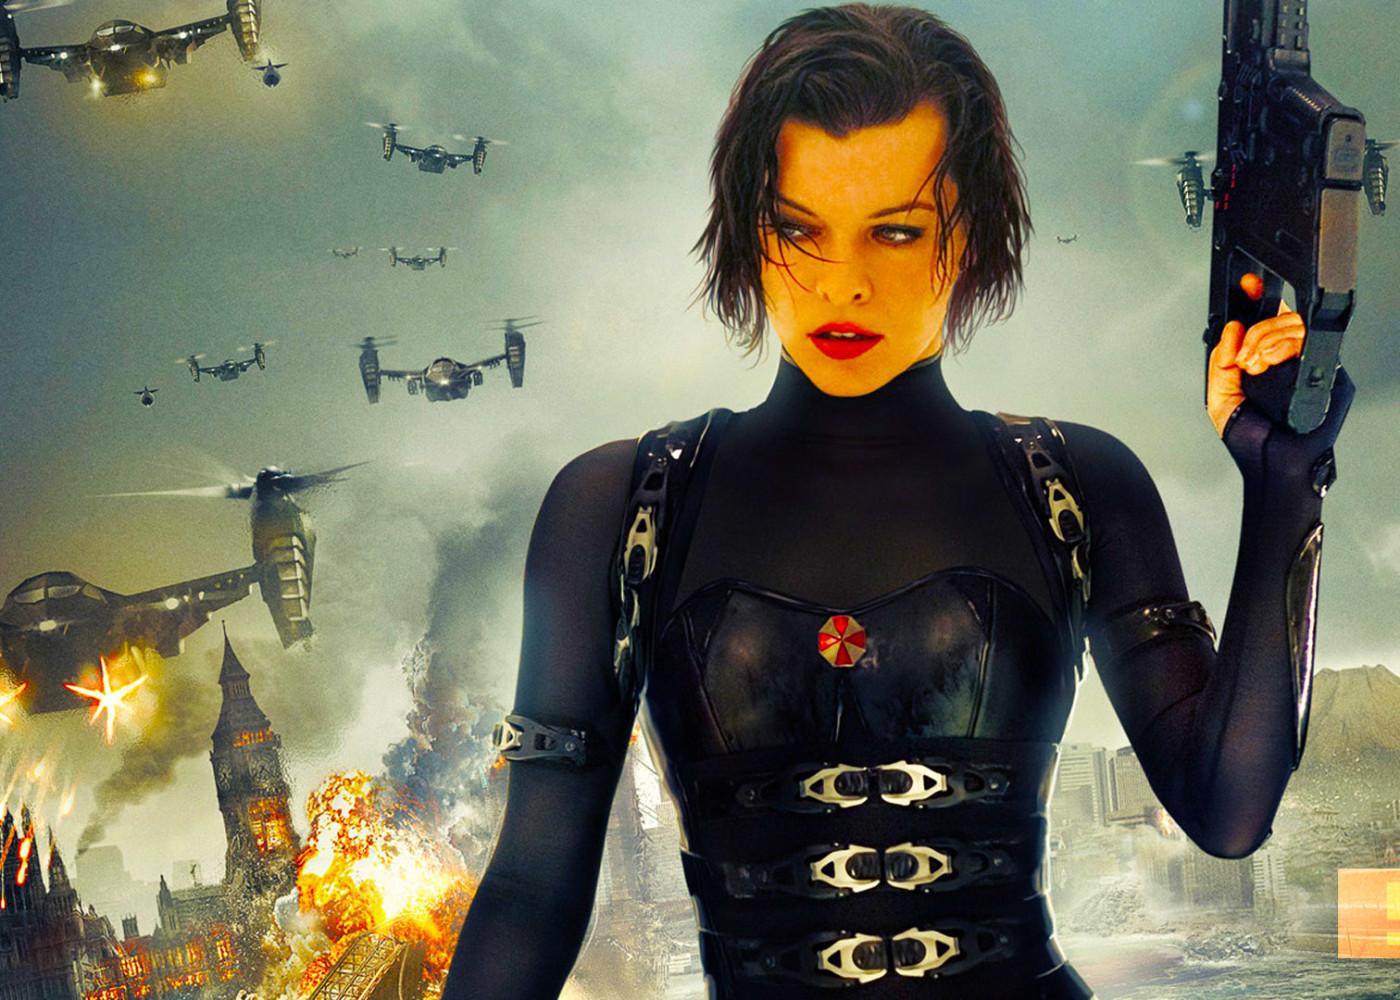 Resident evil 4 ashley hot nude fake sex image